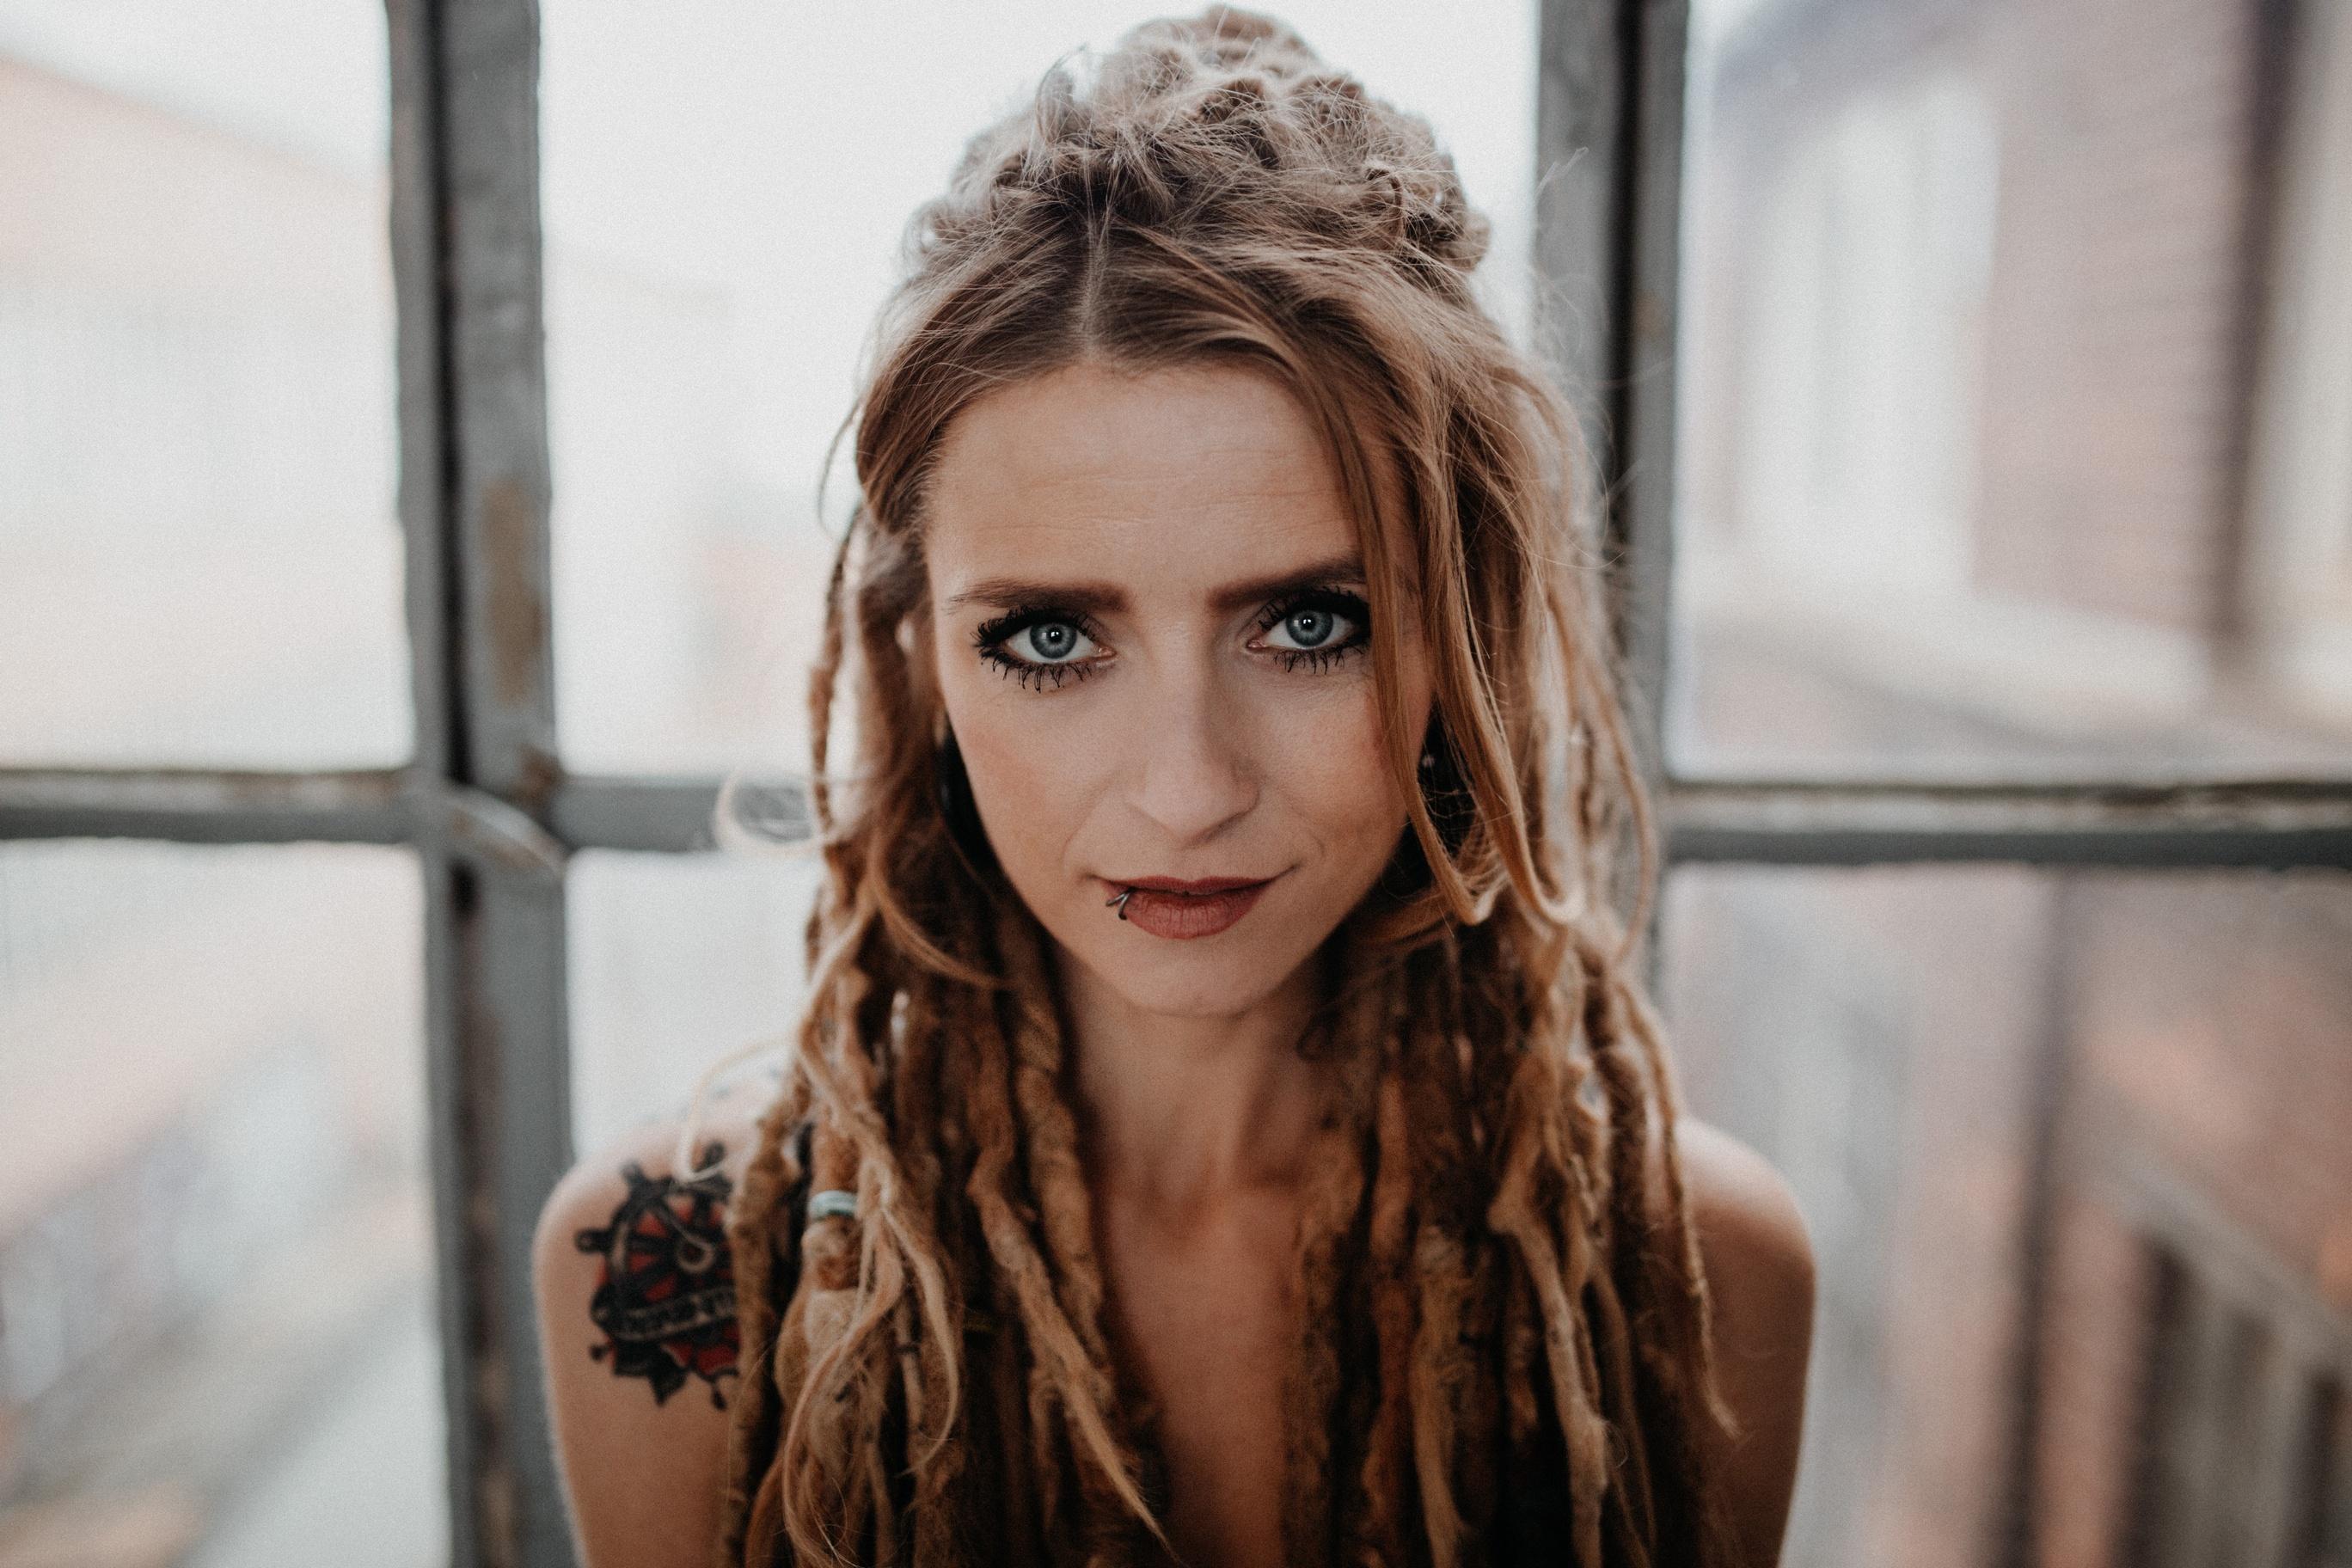 SARAH LESCH LIVE 2018 in Cottbus